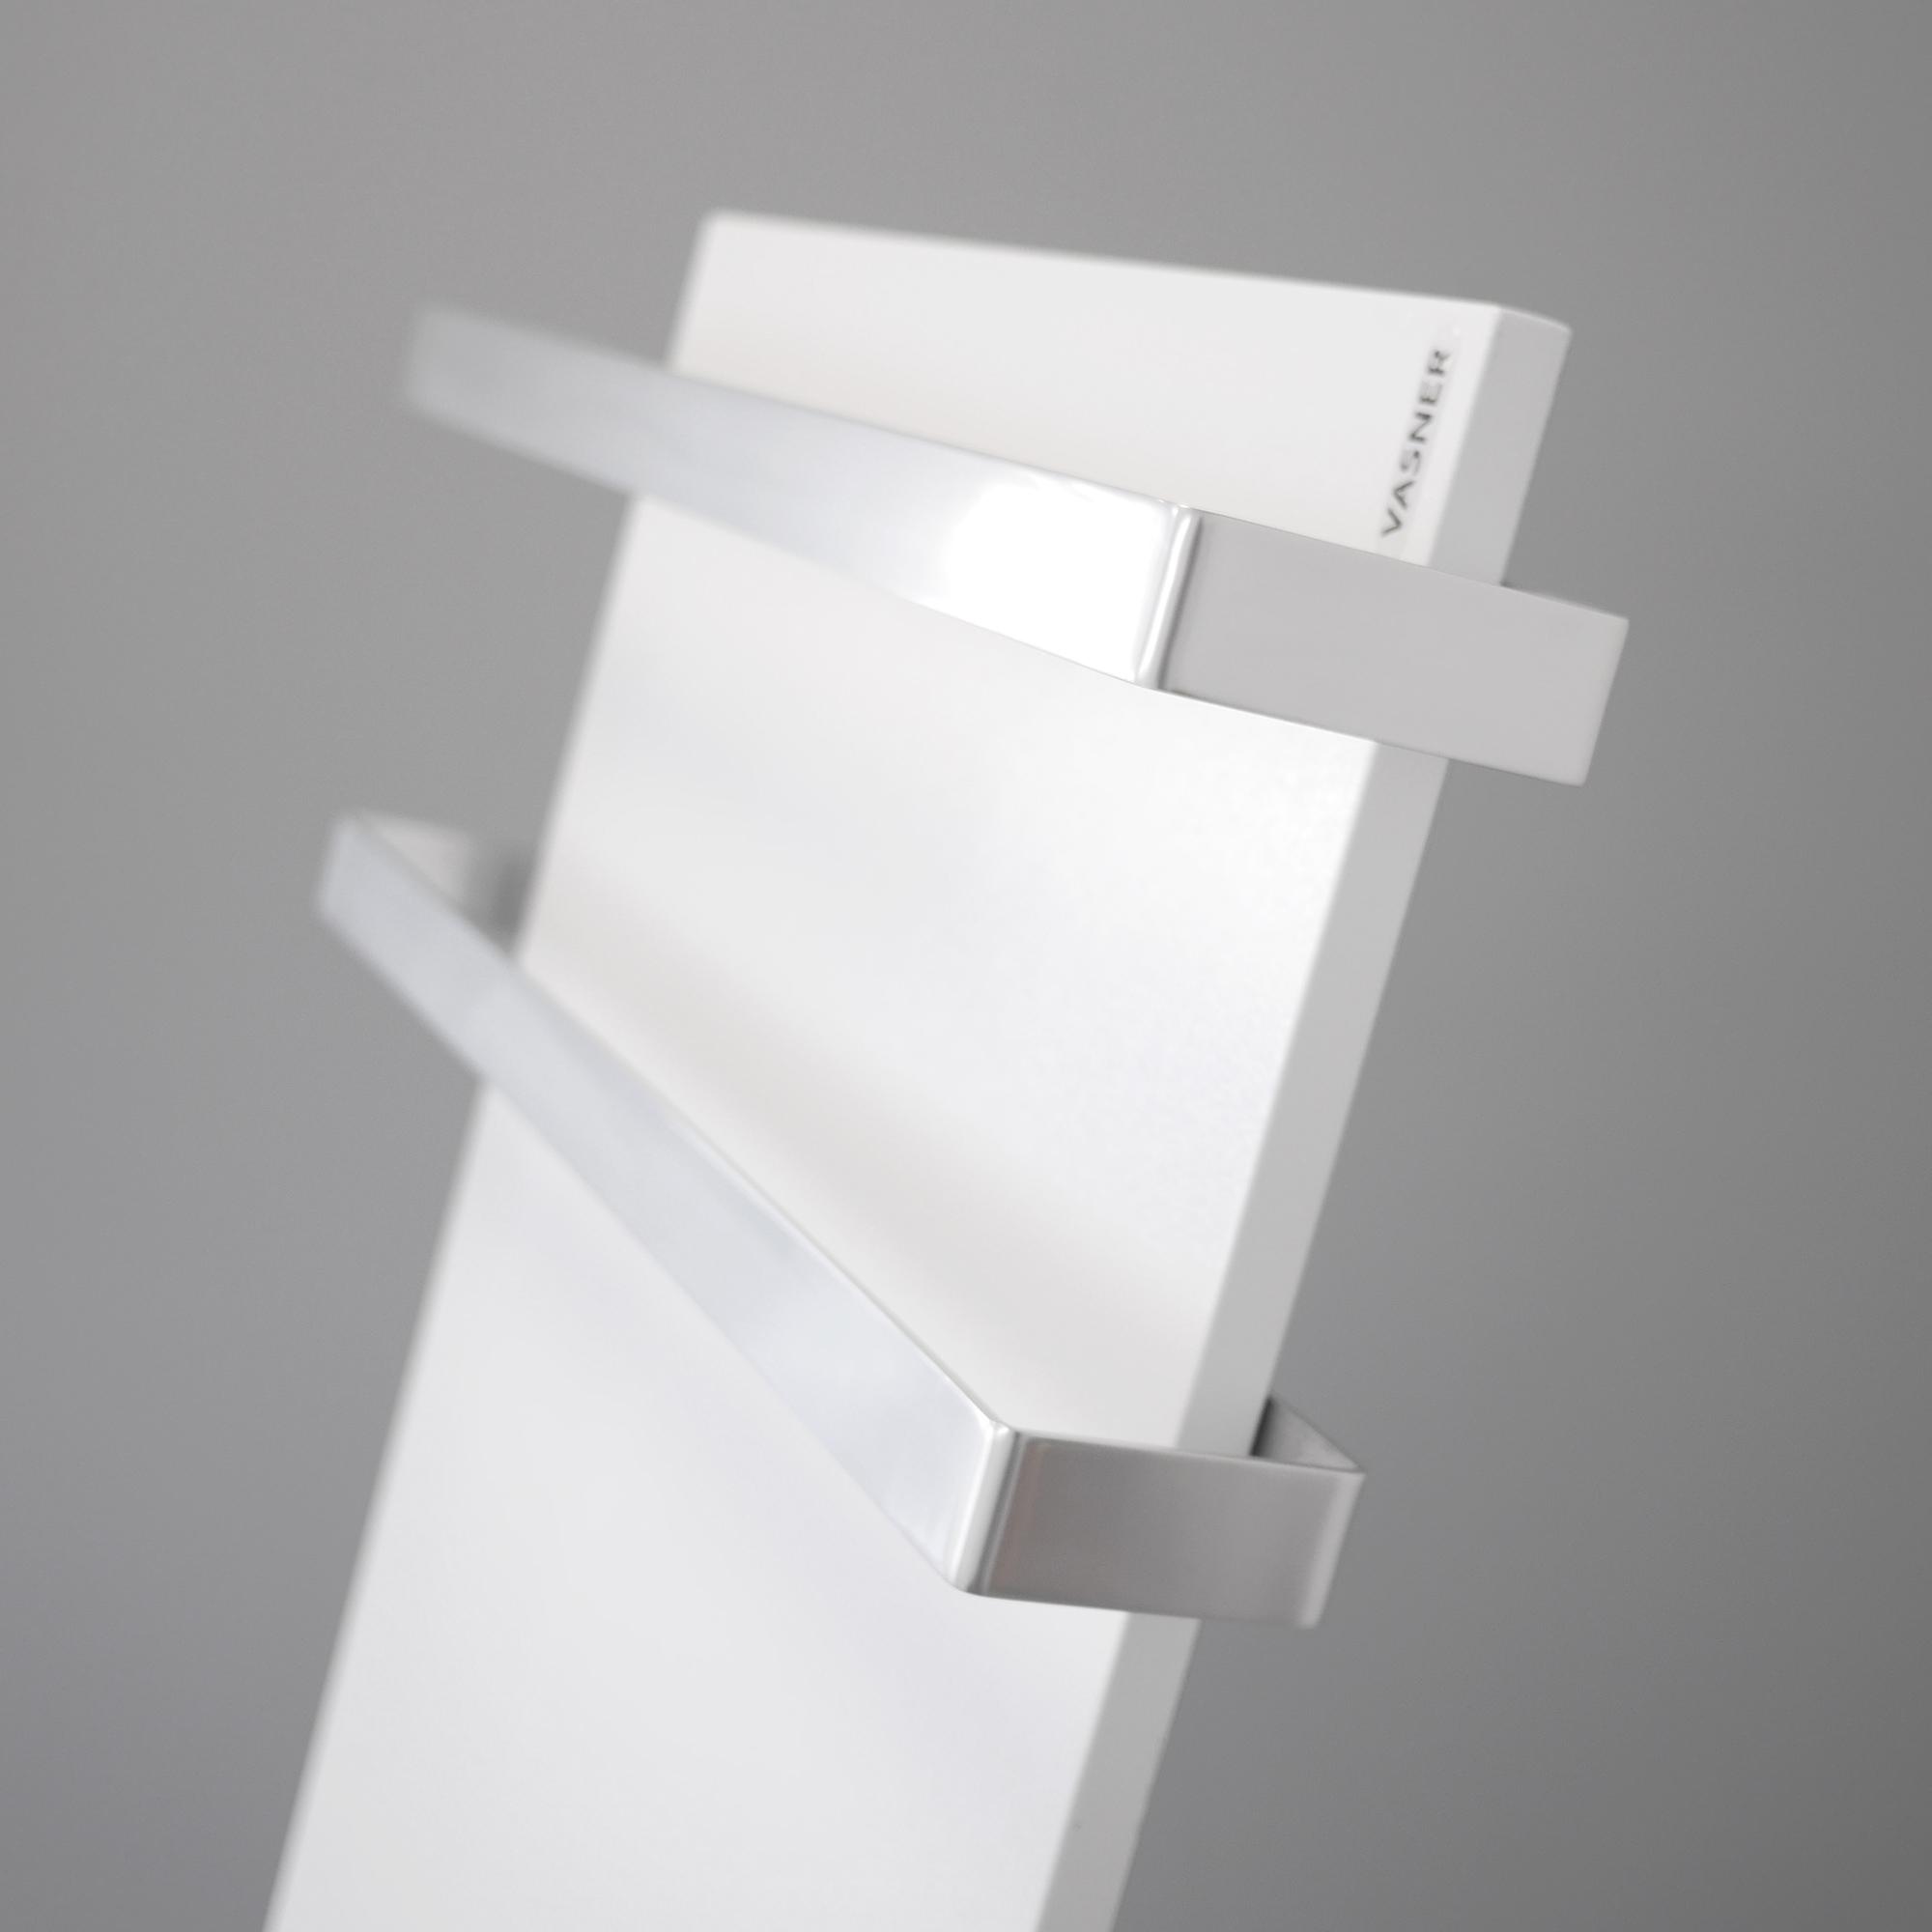 vasner infrarot handtuchtrockner citara serie | vasner shop